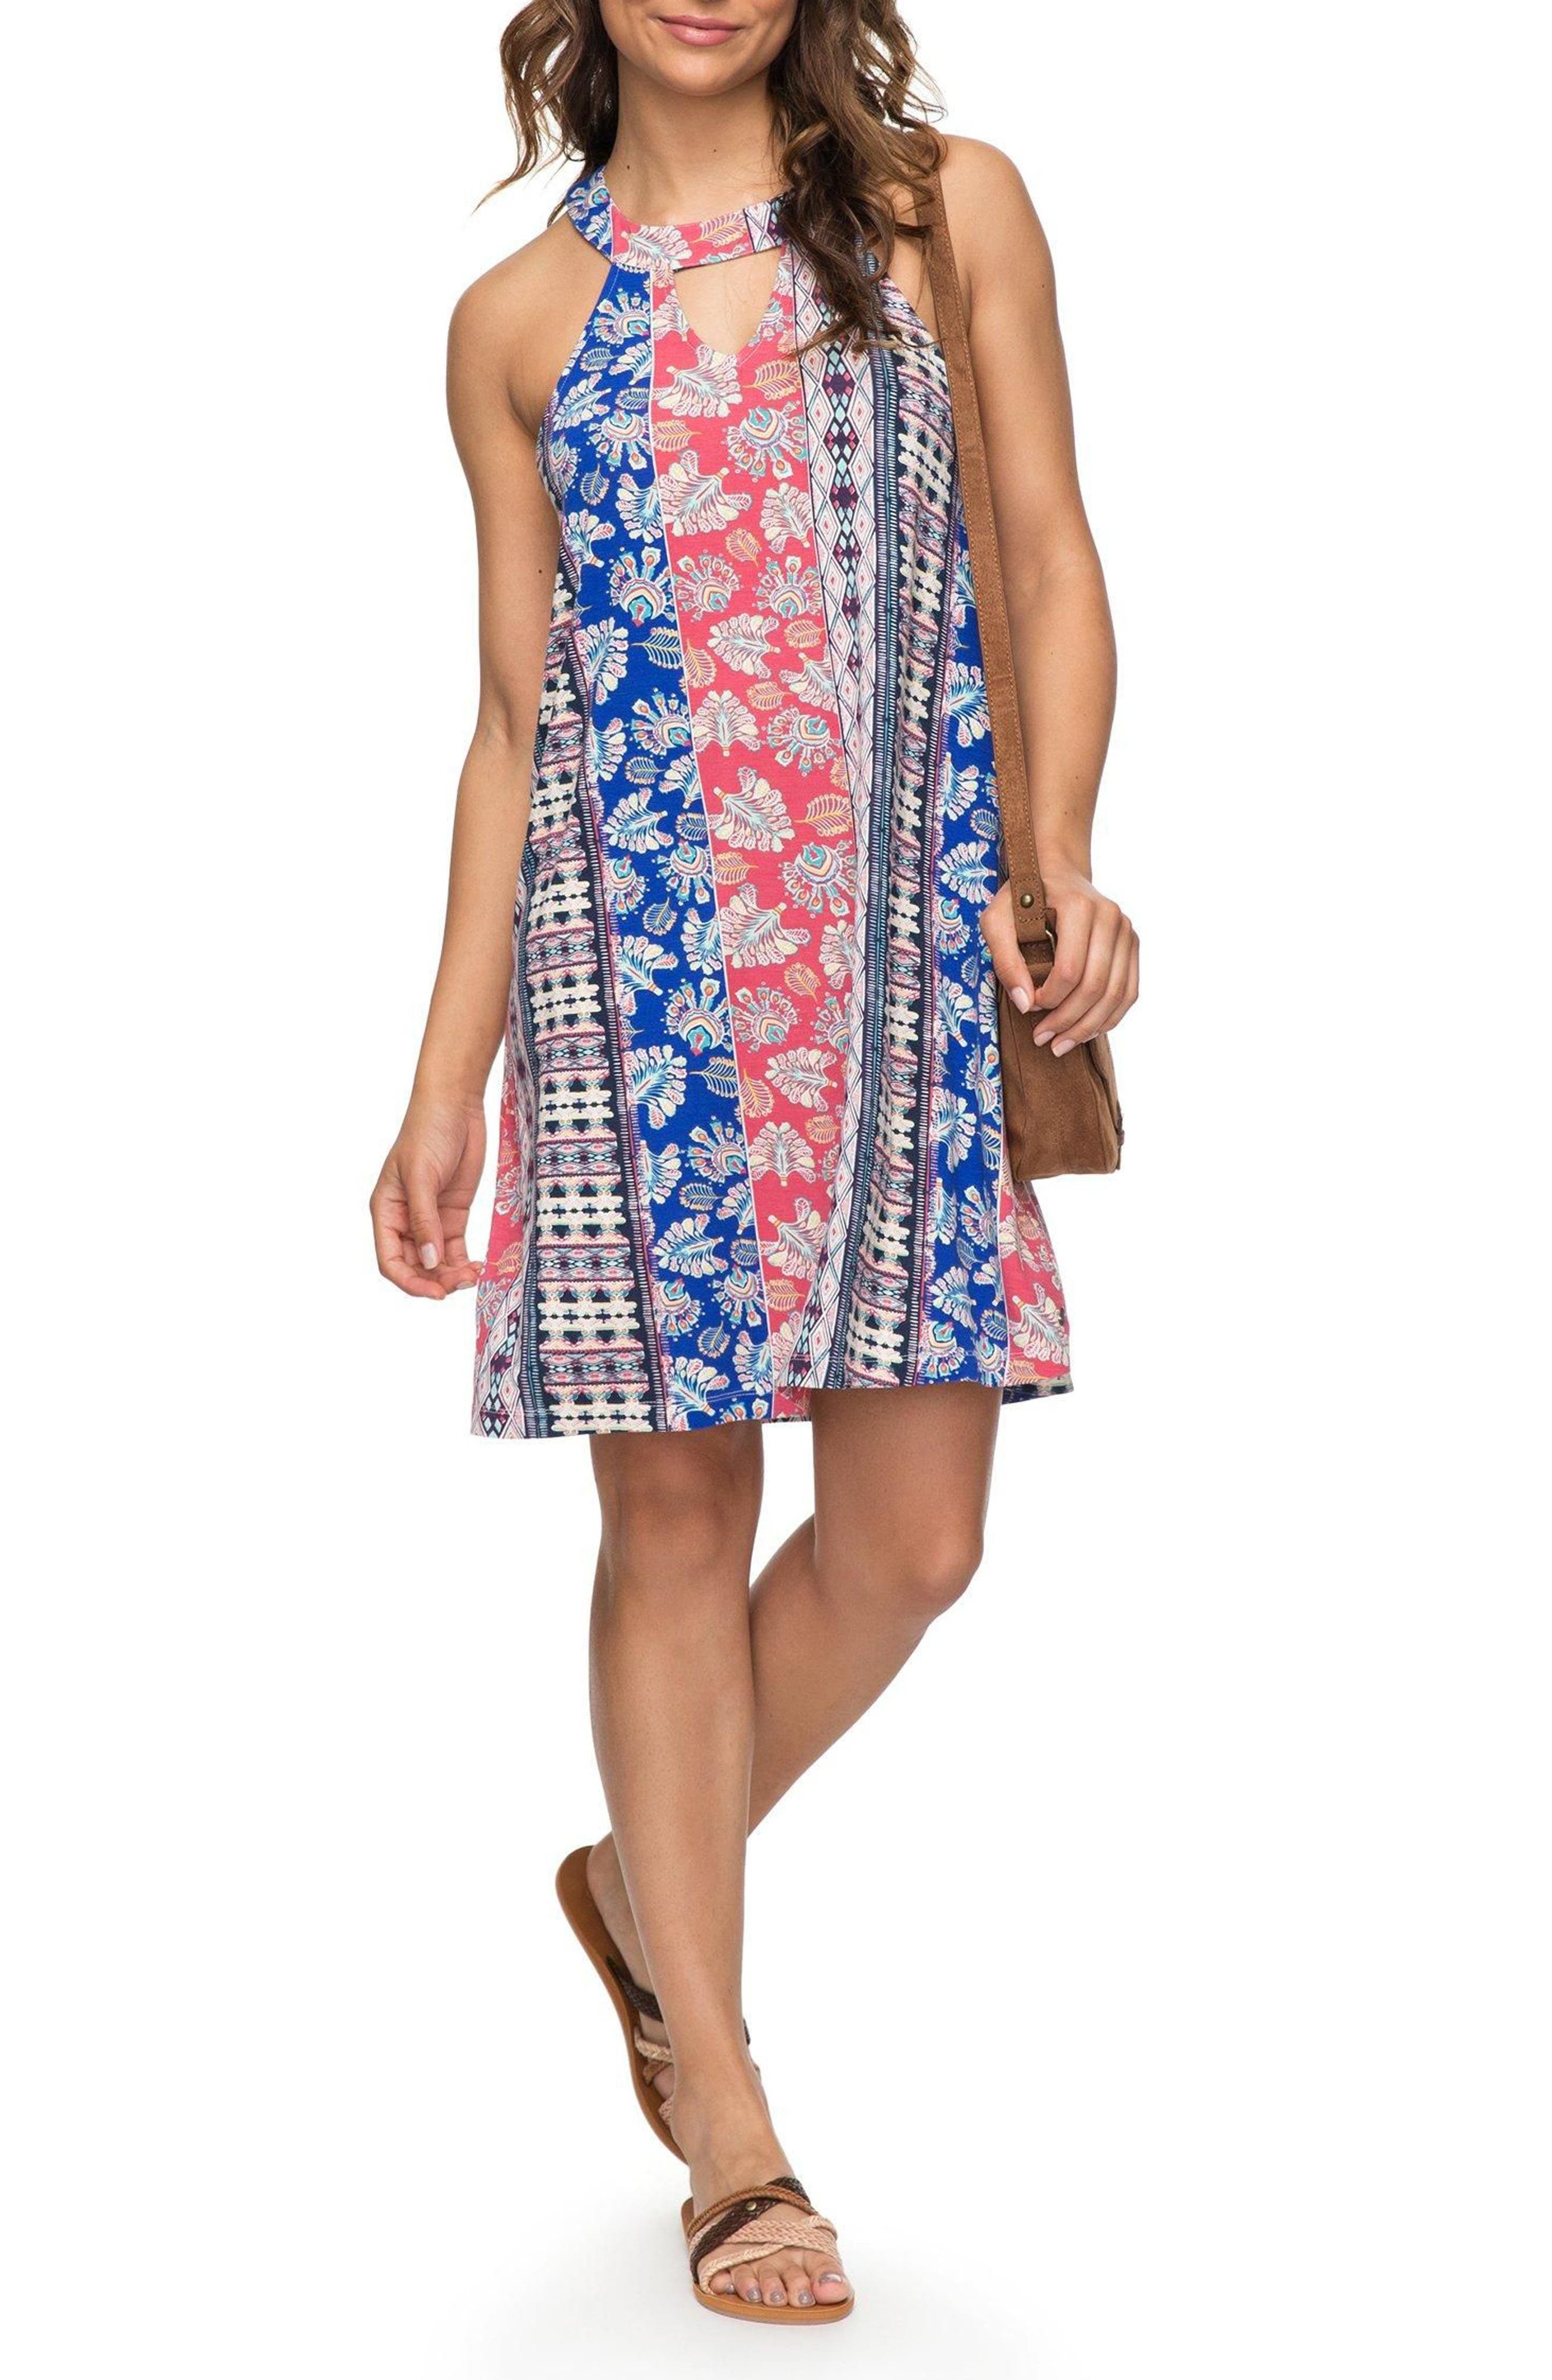 Alternate Image 1 Selected - Roxy Print Halter Dress